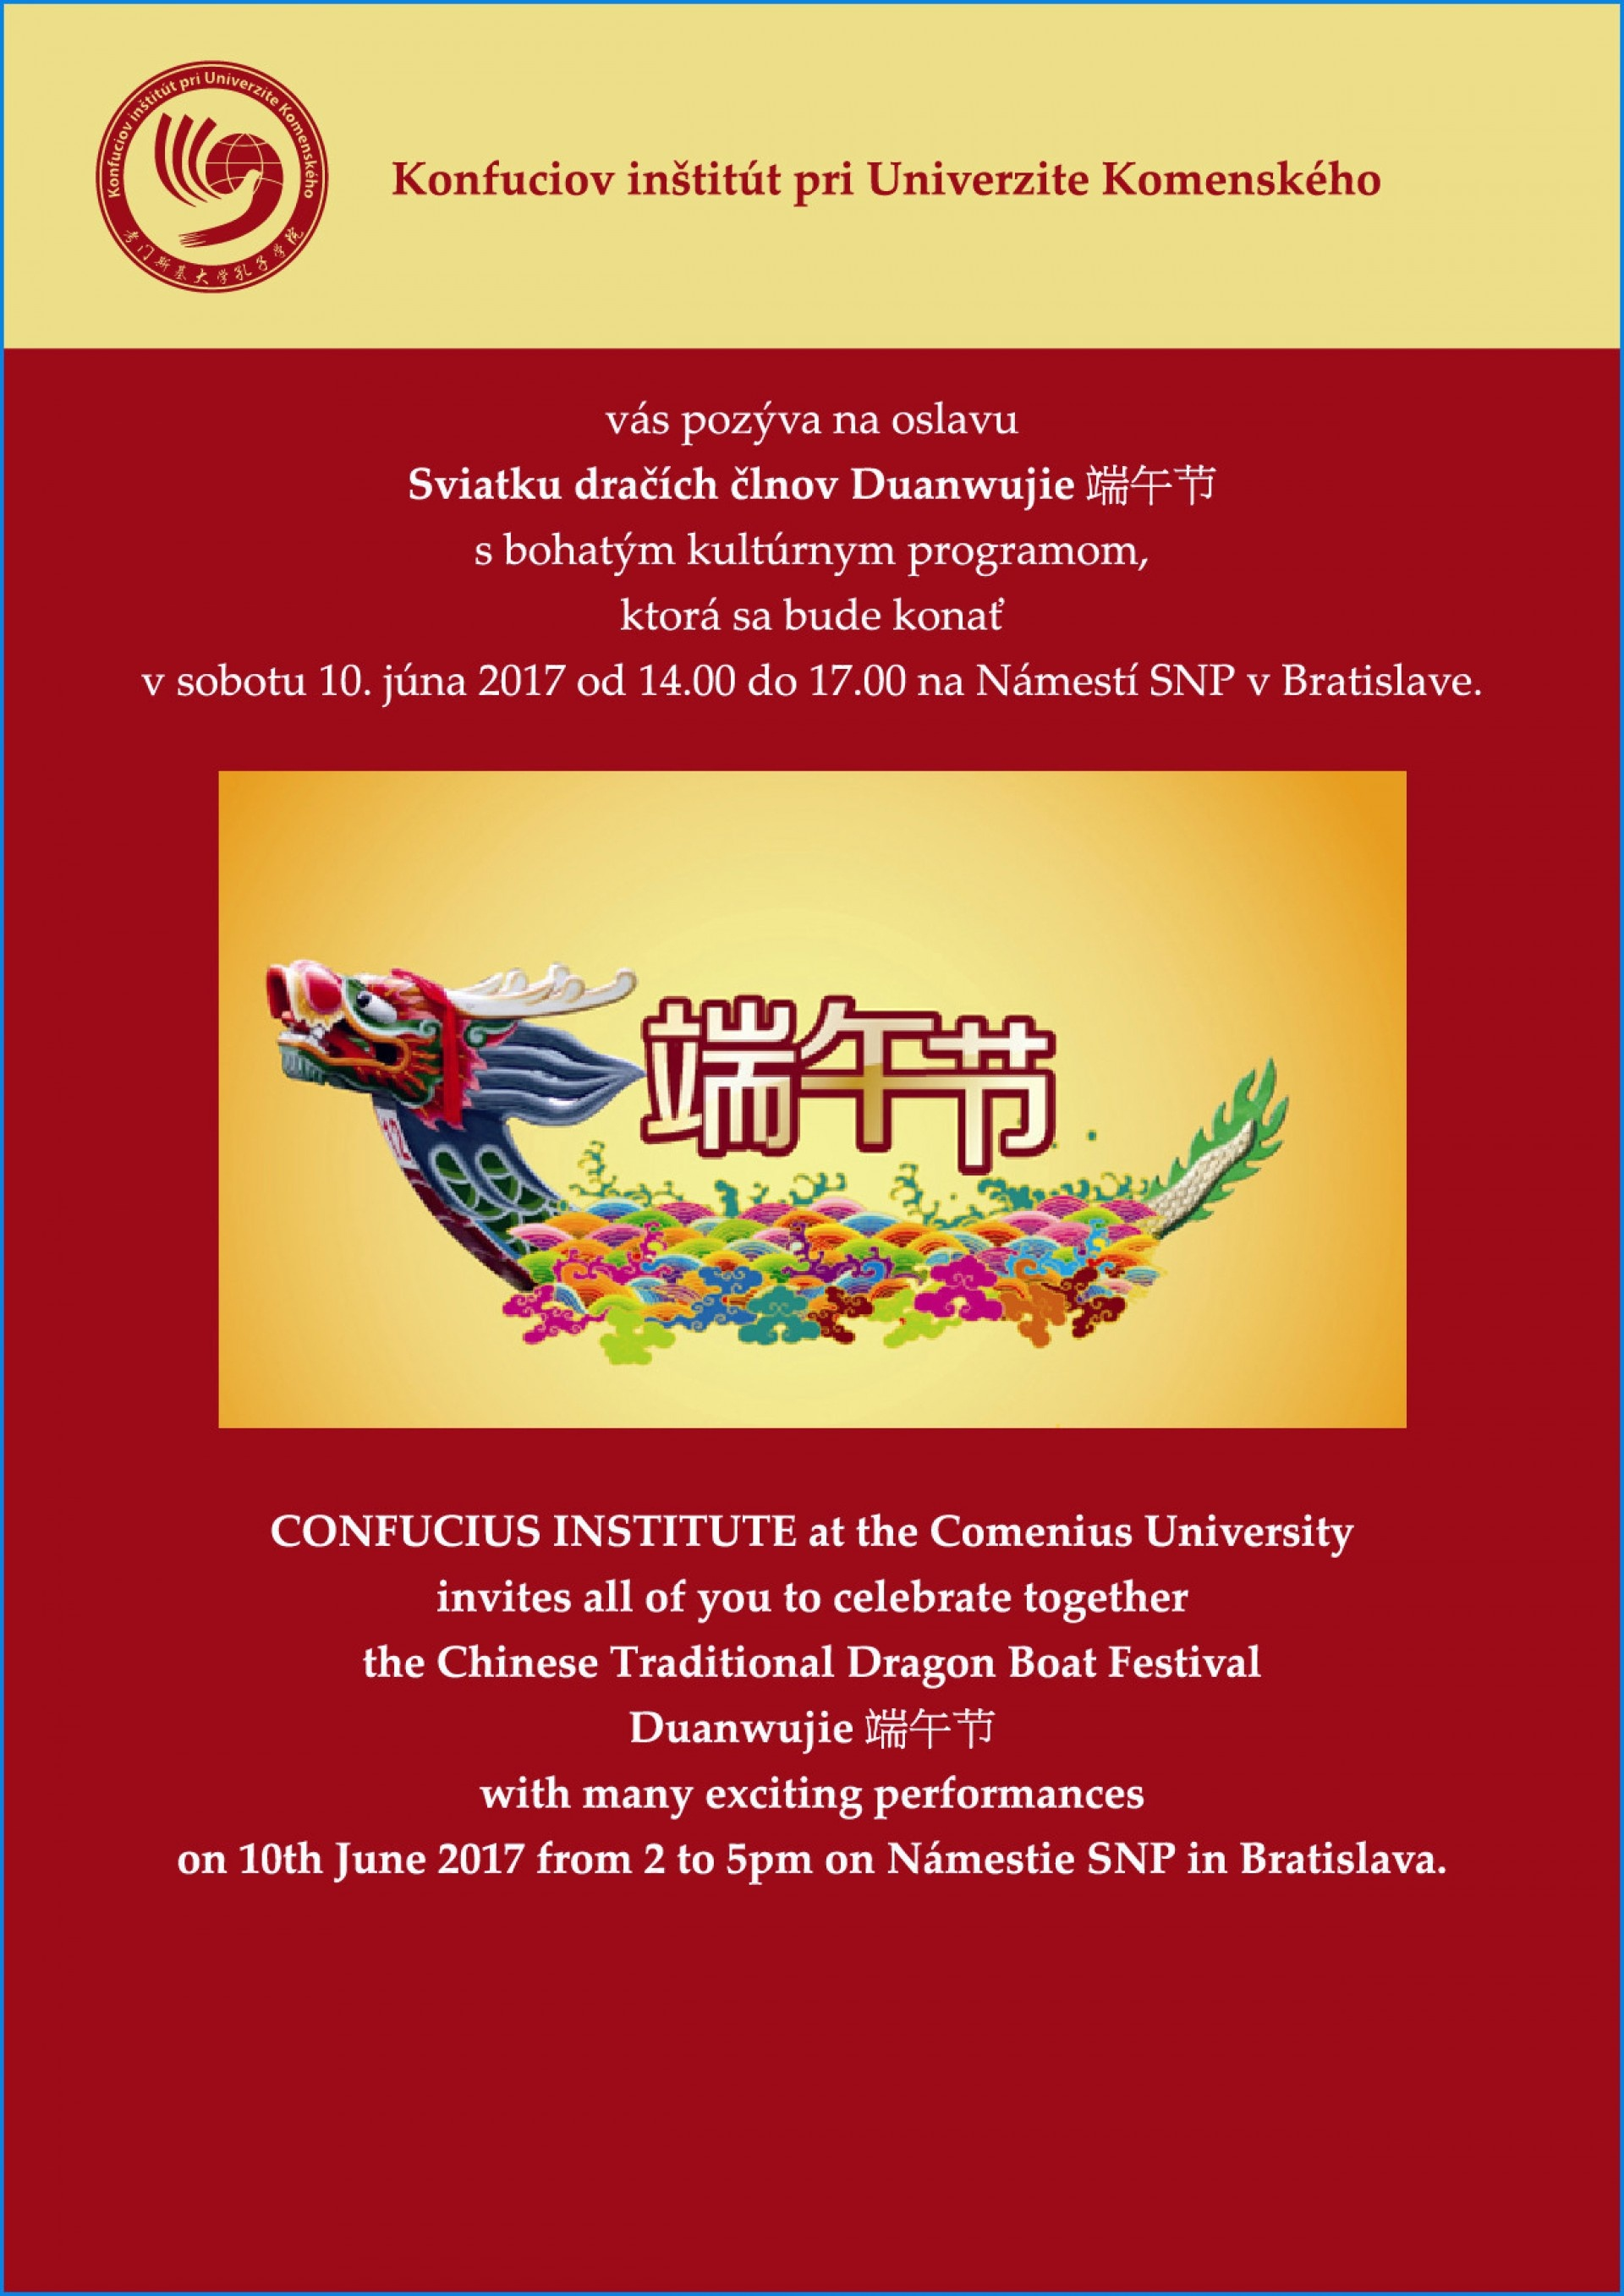 026 Template Ideas Invitation To Church Service Flyer Fresh Free - Free Printable Religious Christmas Invitations